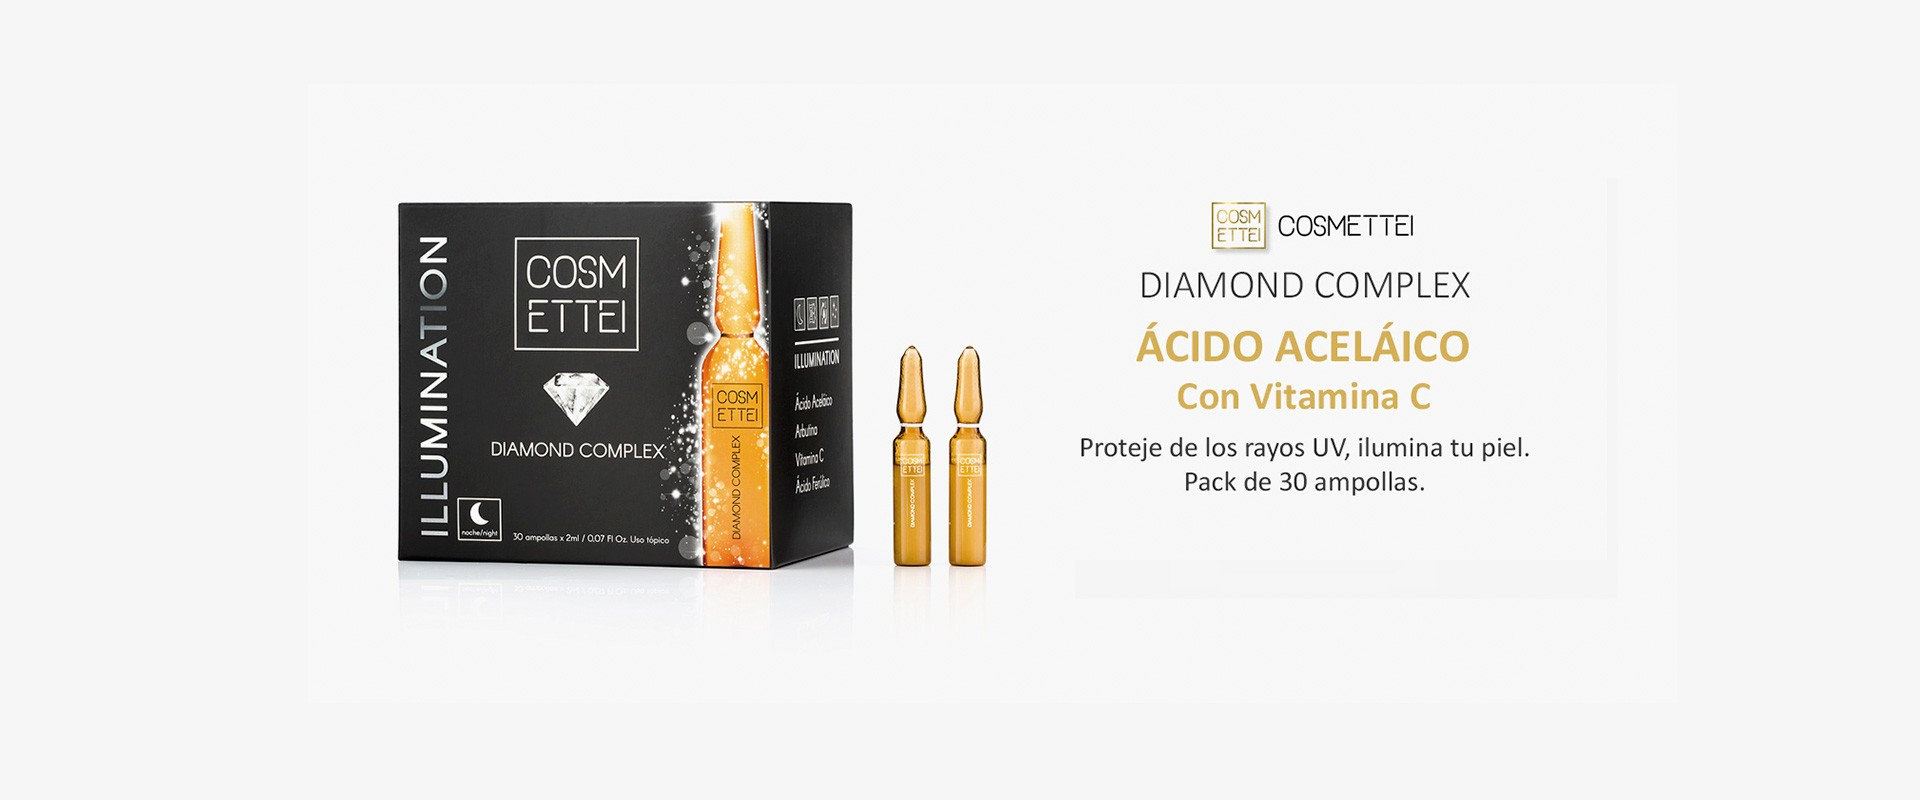 Diamond complex